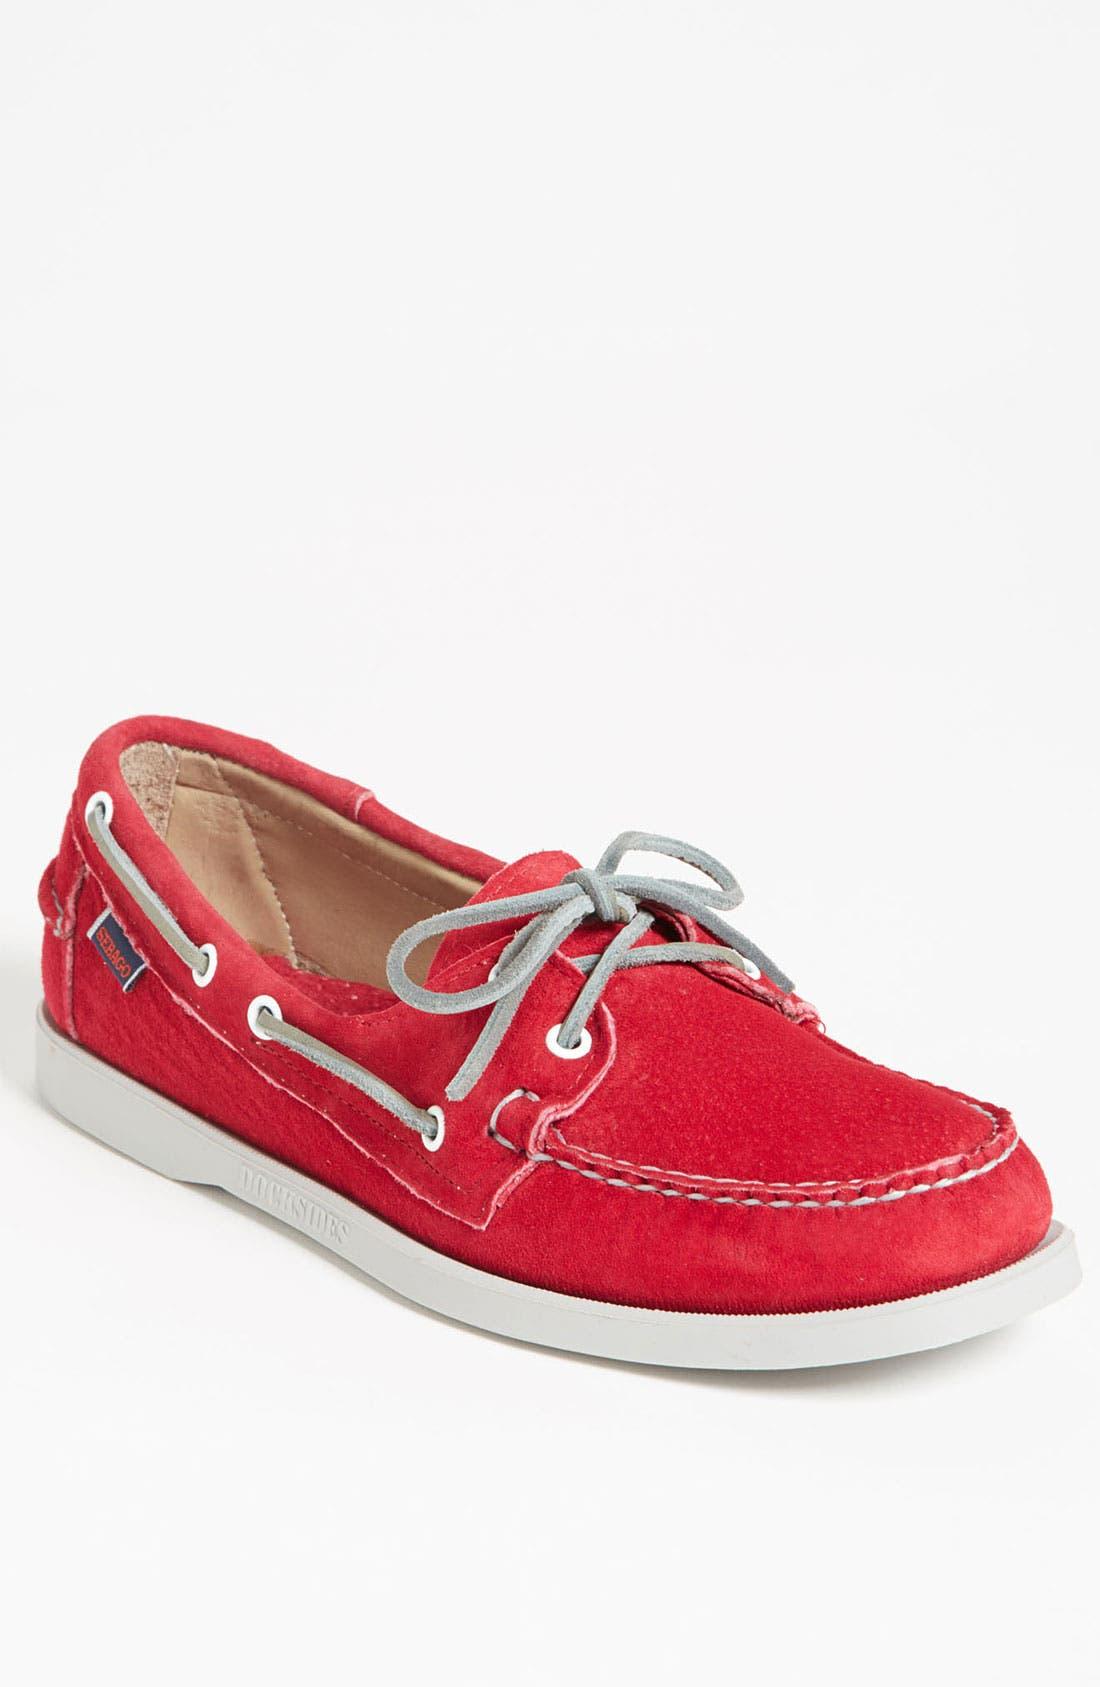 Main Image - Sebago 'Docksides®' Suede Boat Shoe